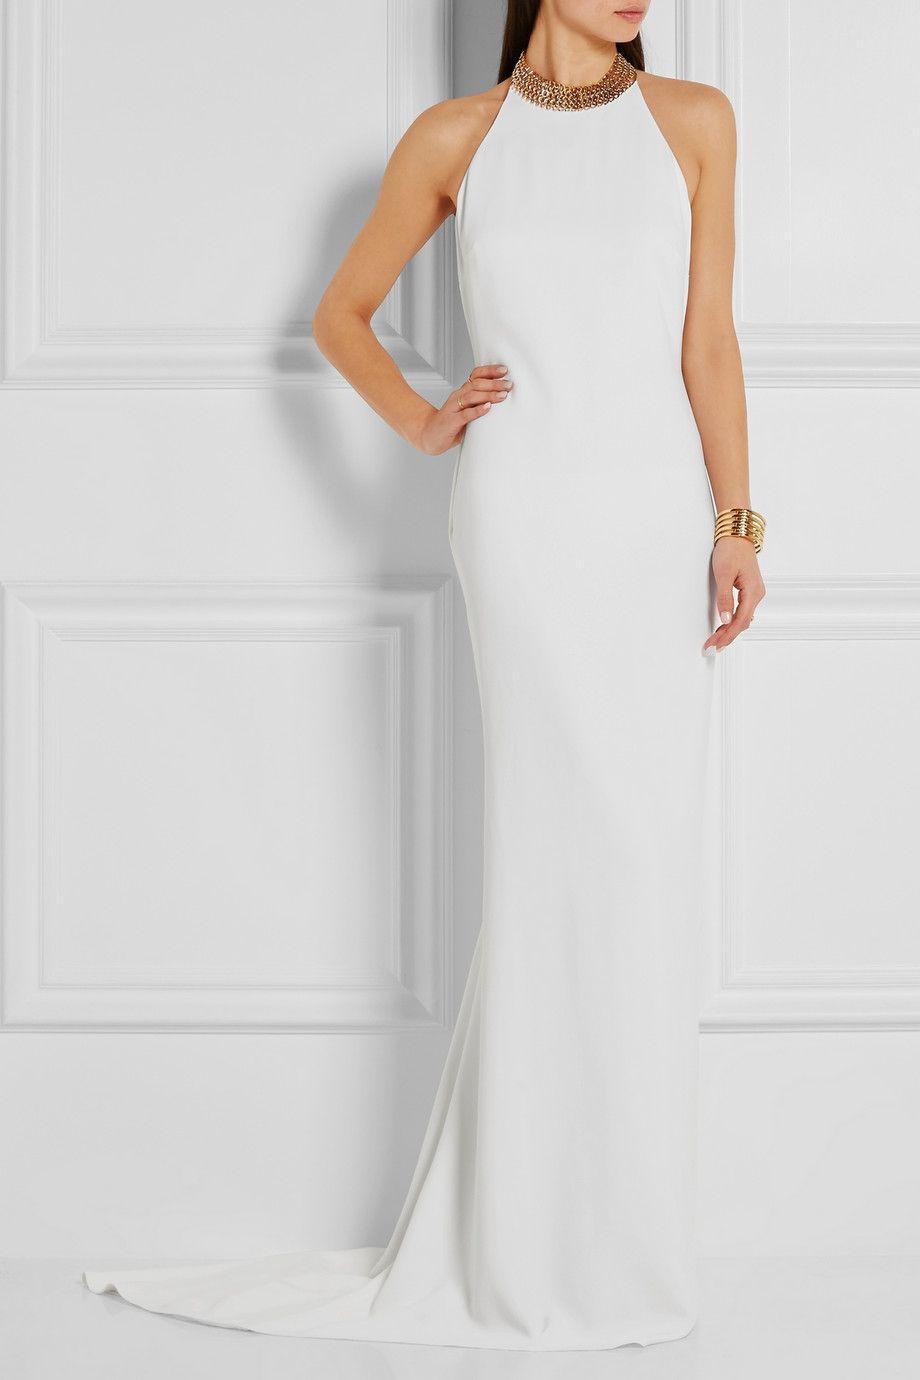 7977a4b30dc0 STELLA MCCARTNEY Halterneck chain-embellished stretch-crepe gown ...